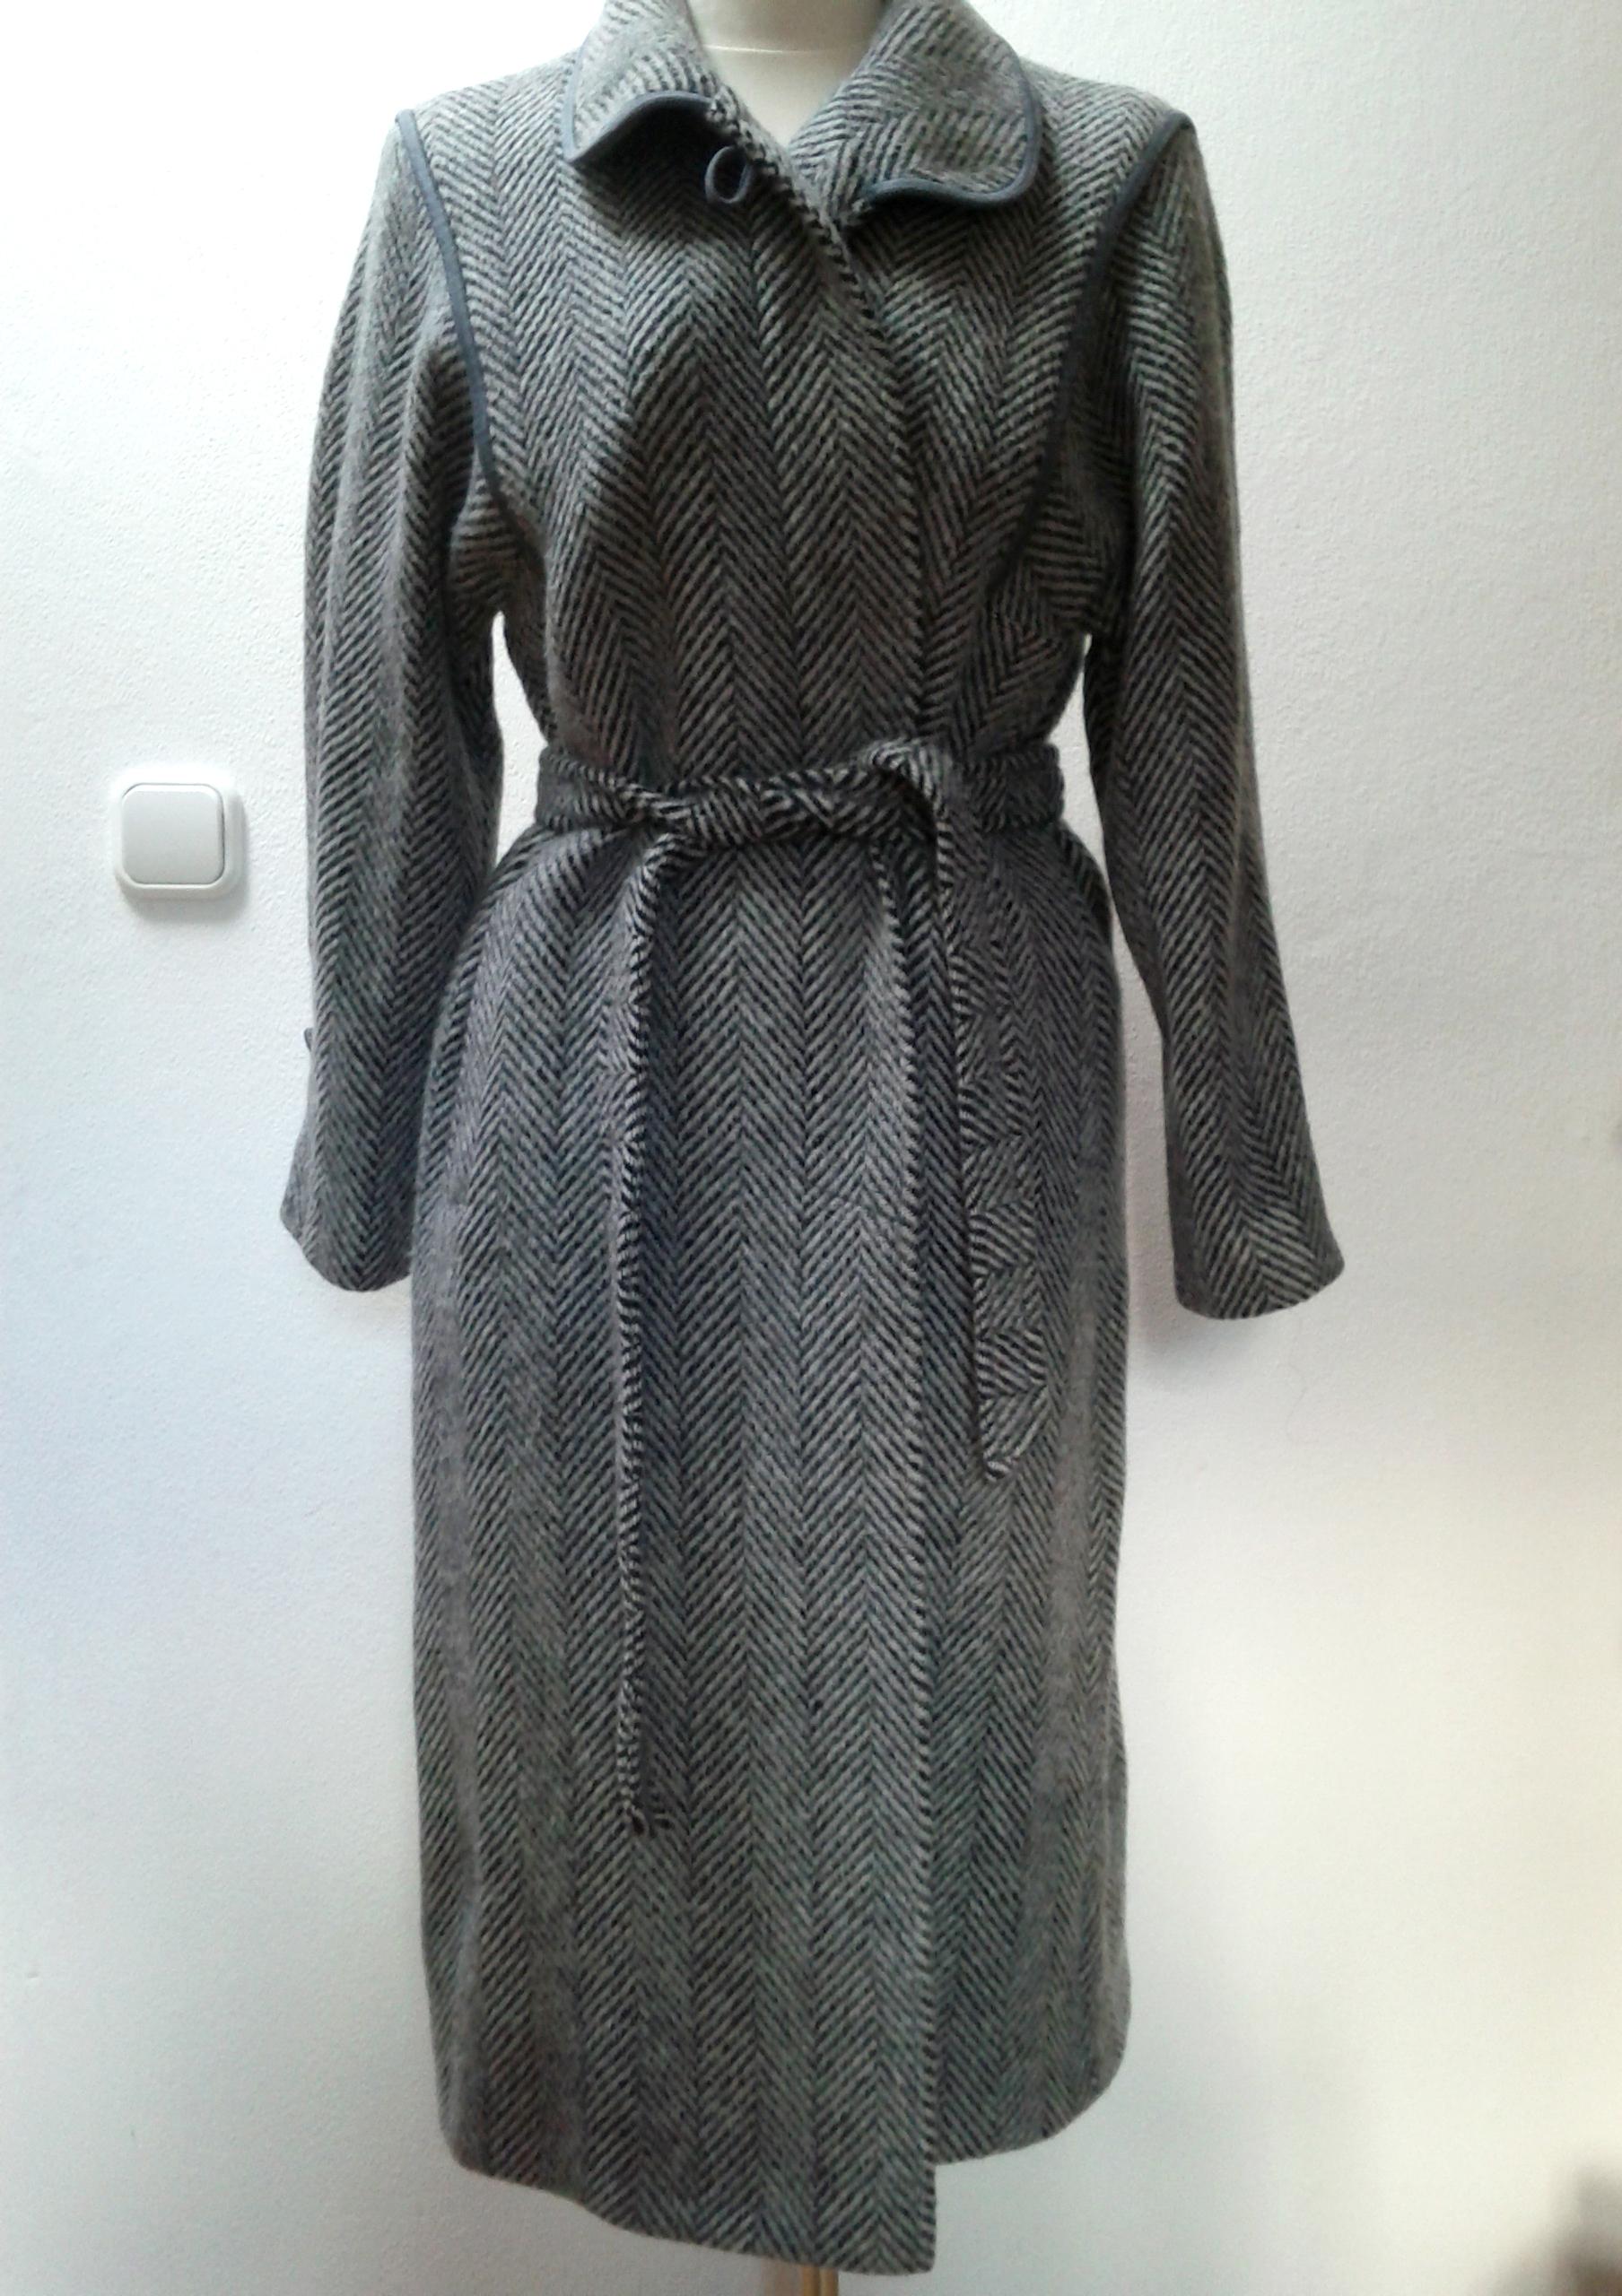 Solfin gyapjú kabát - Angex